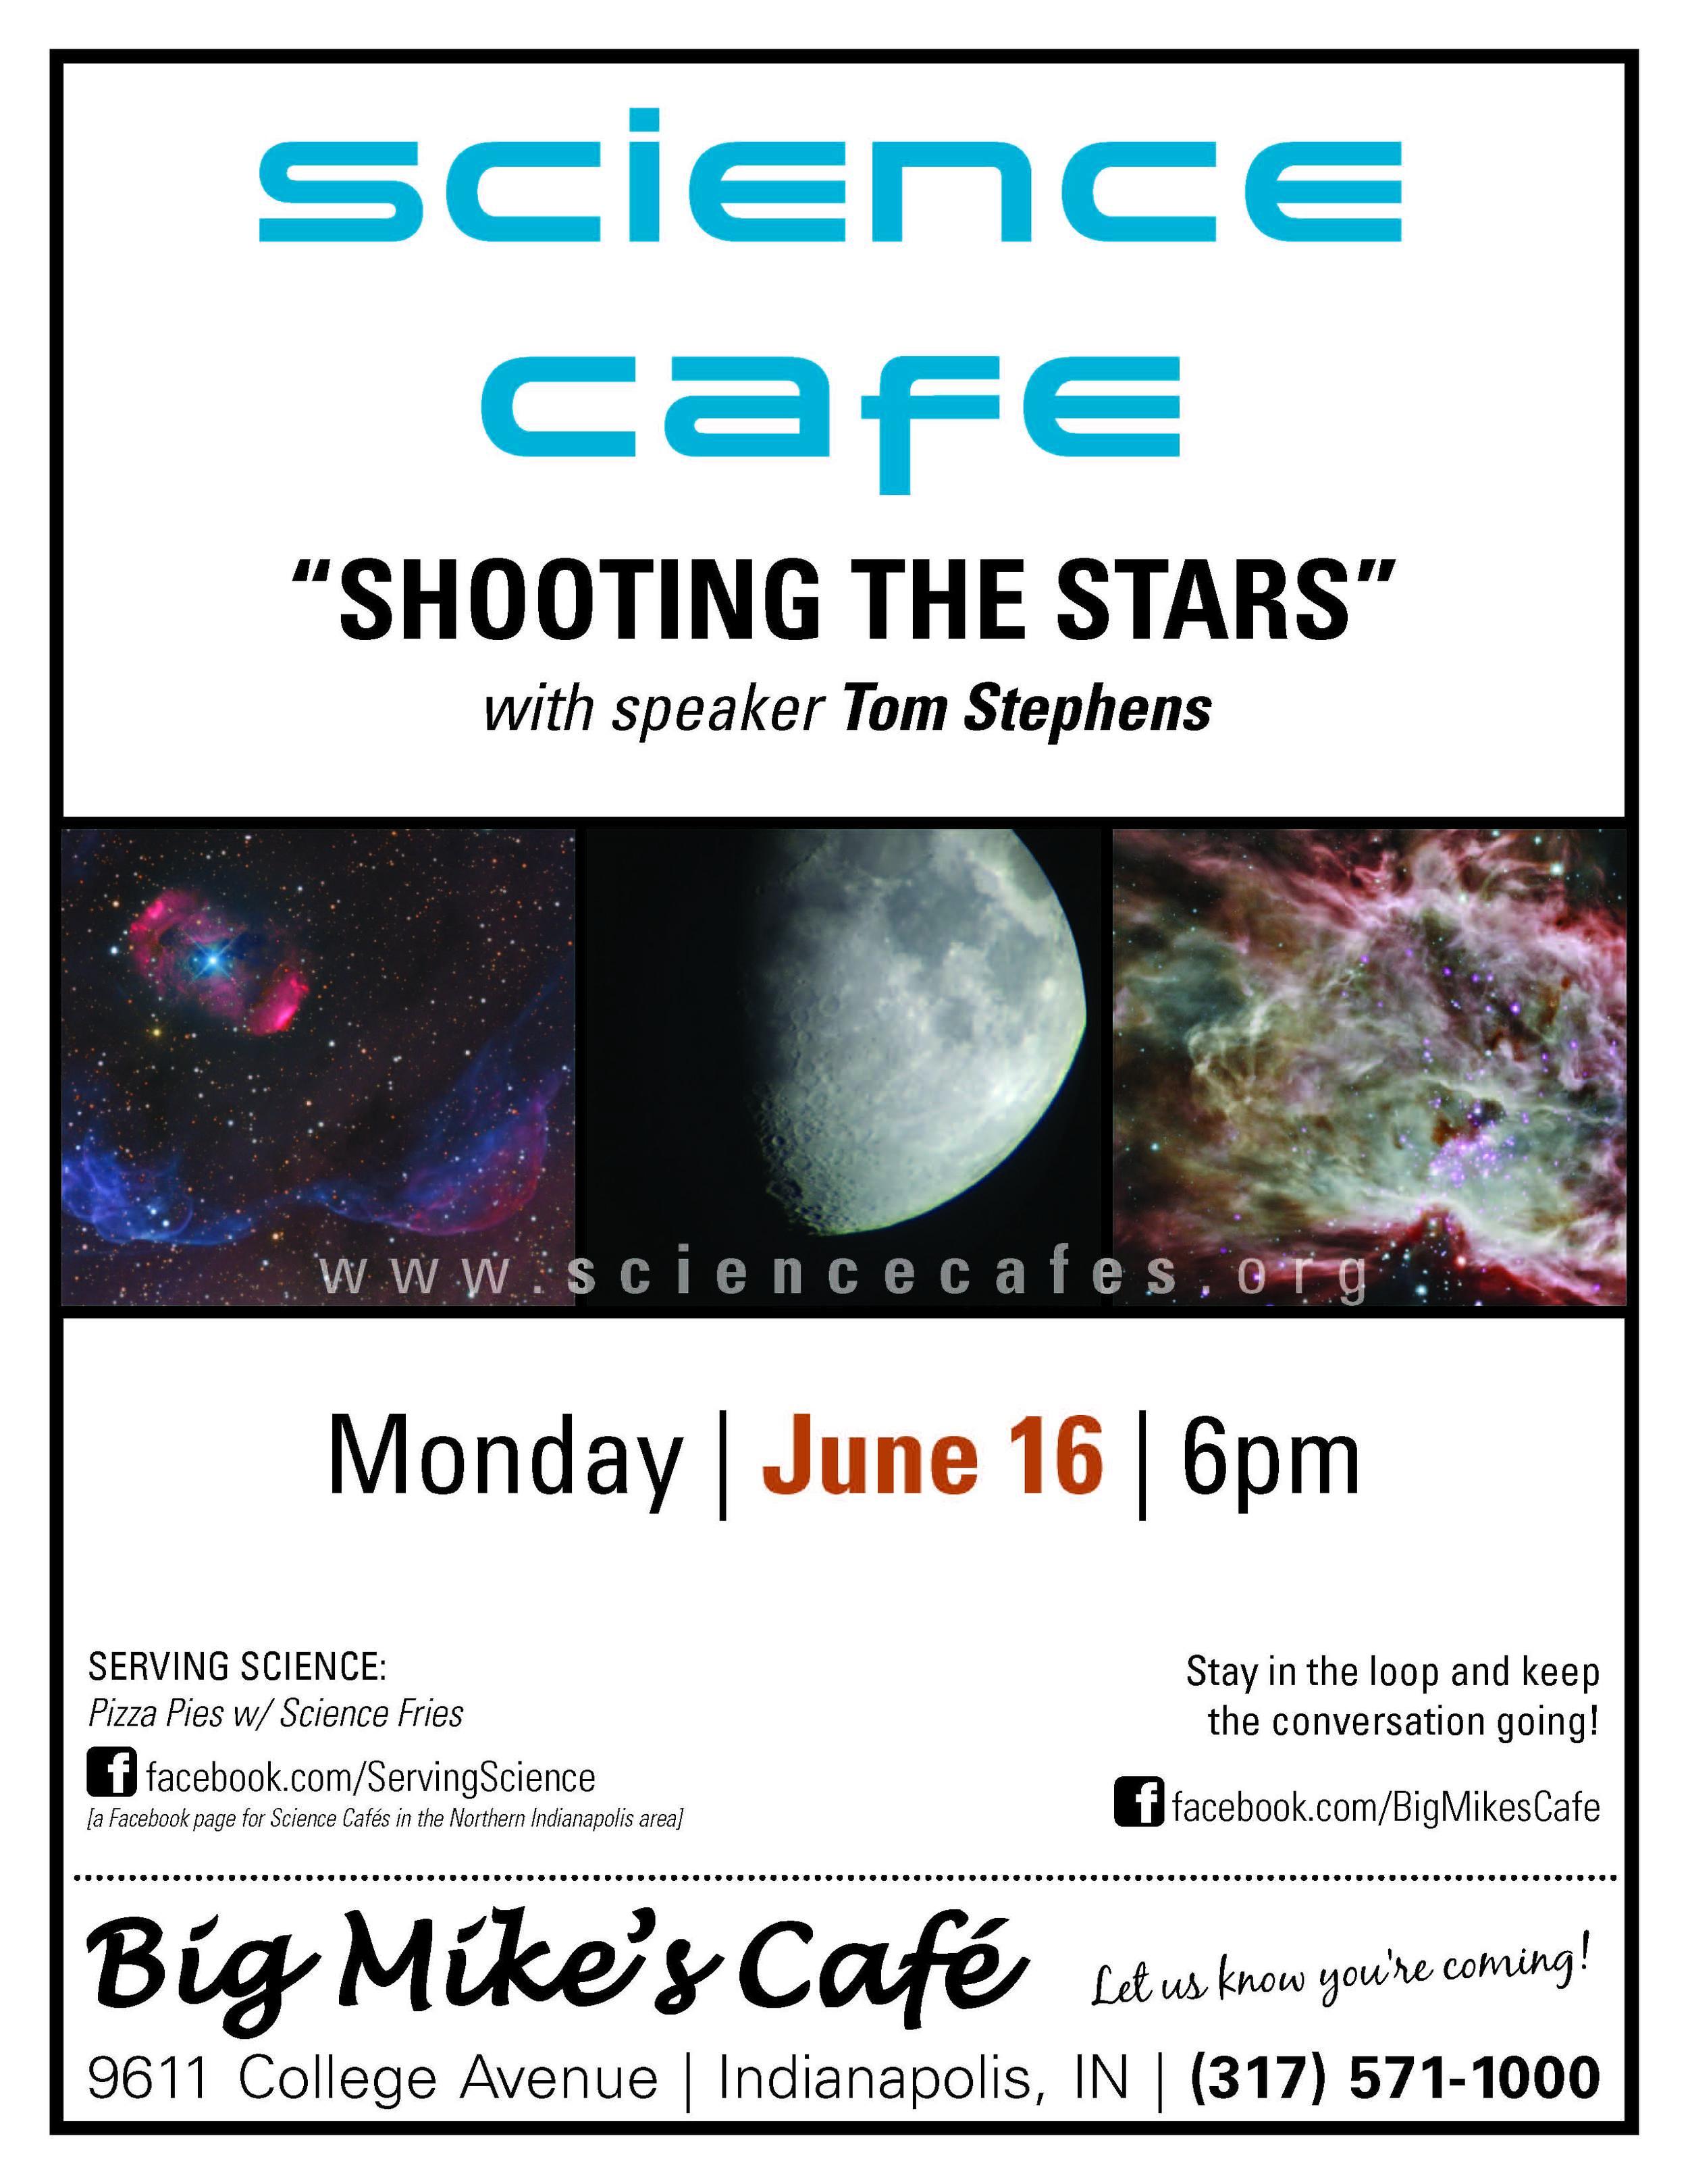 ScienceCafe_ShootingTheStars.jpg